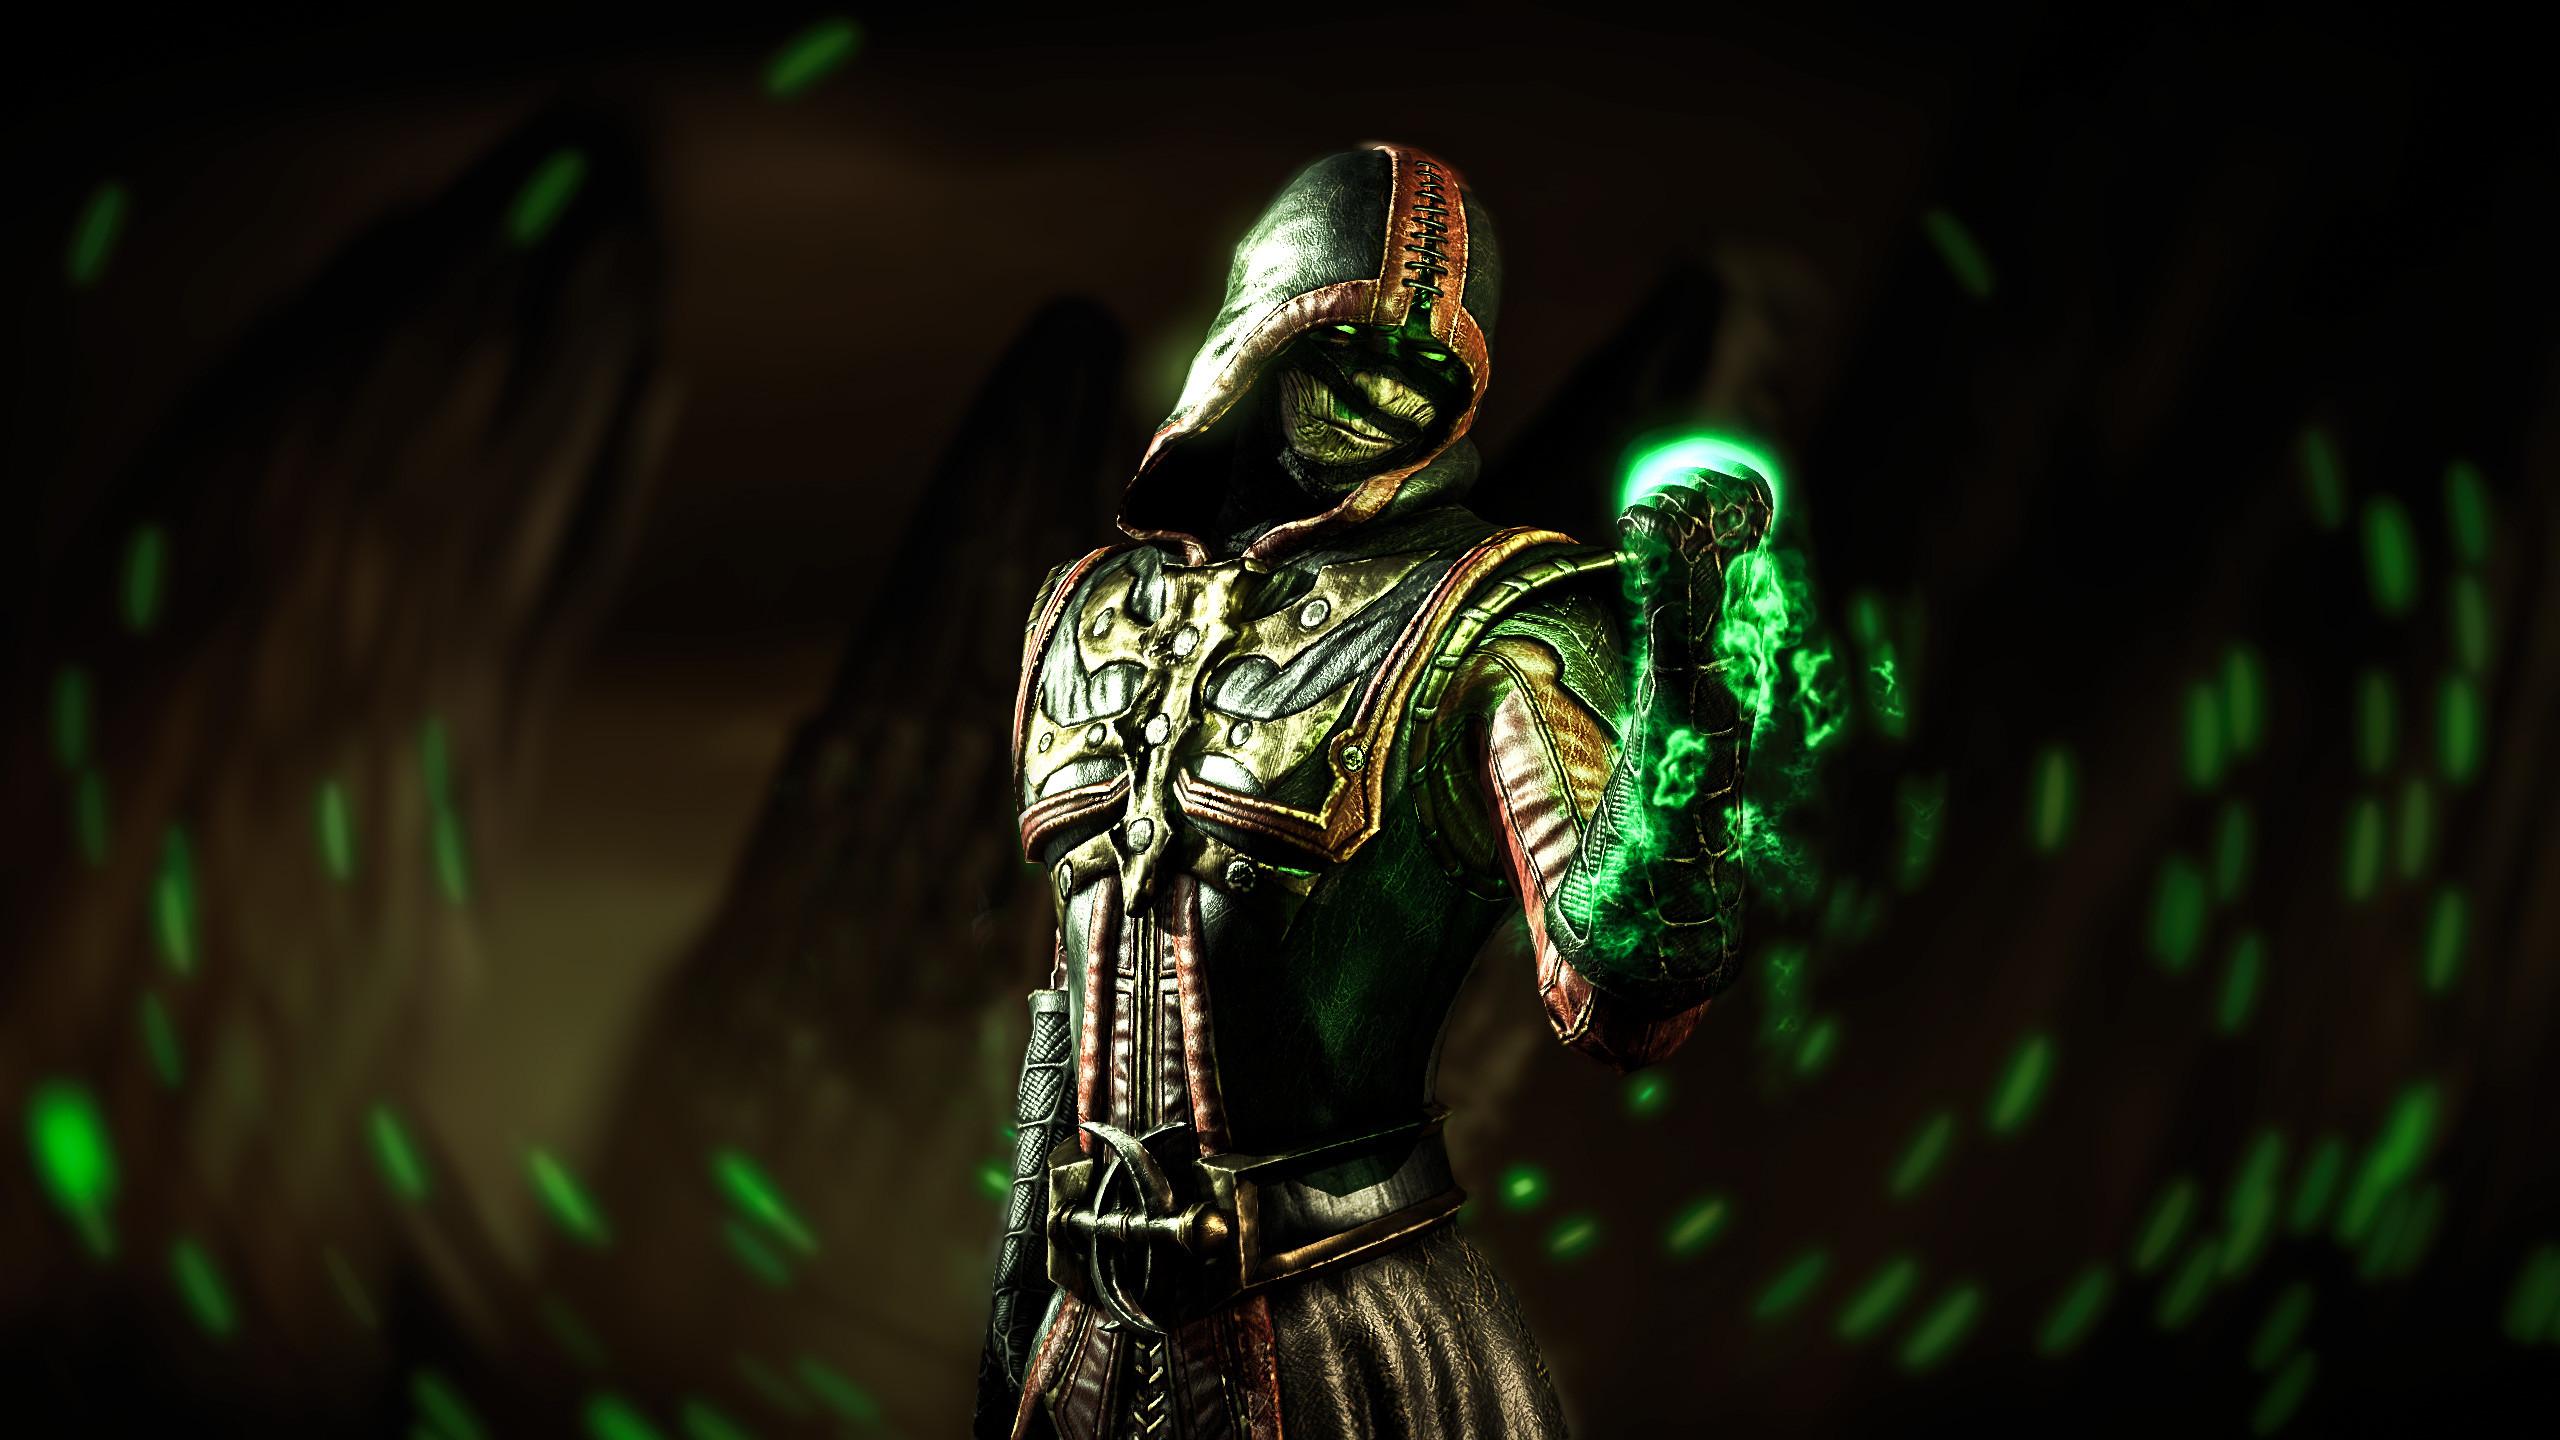 Games / Ermac Wallpaper. Ermac, Mortal Kombat X